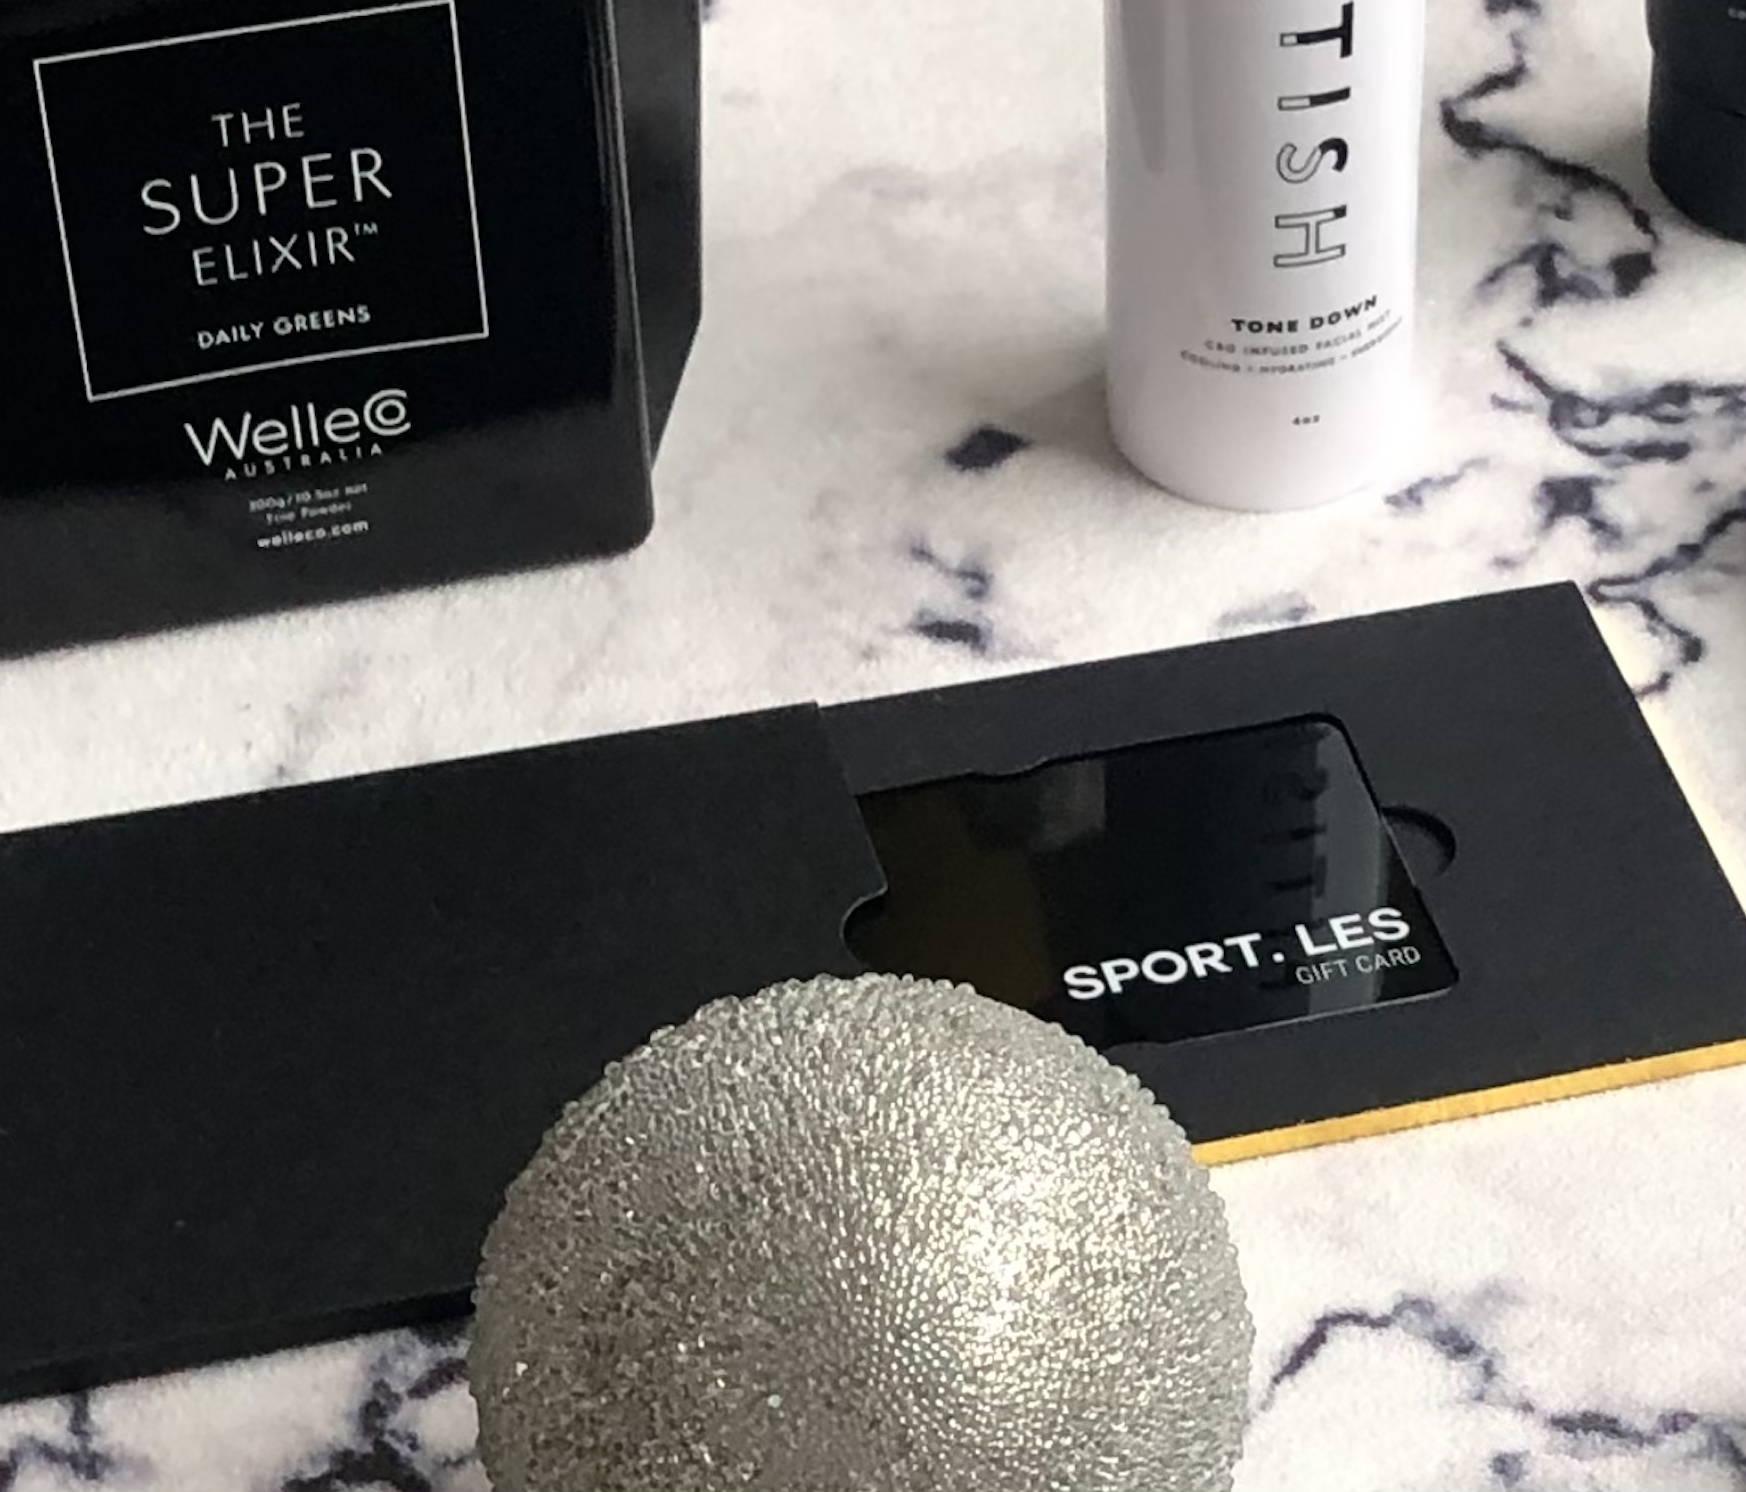 SPORTLES.com Gift Cards